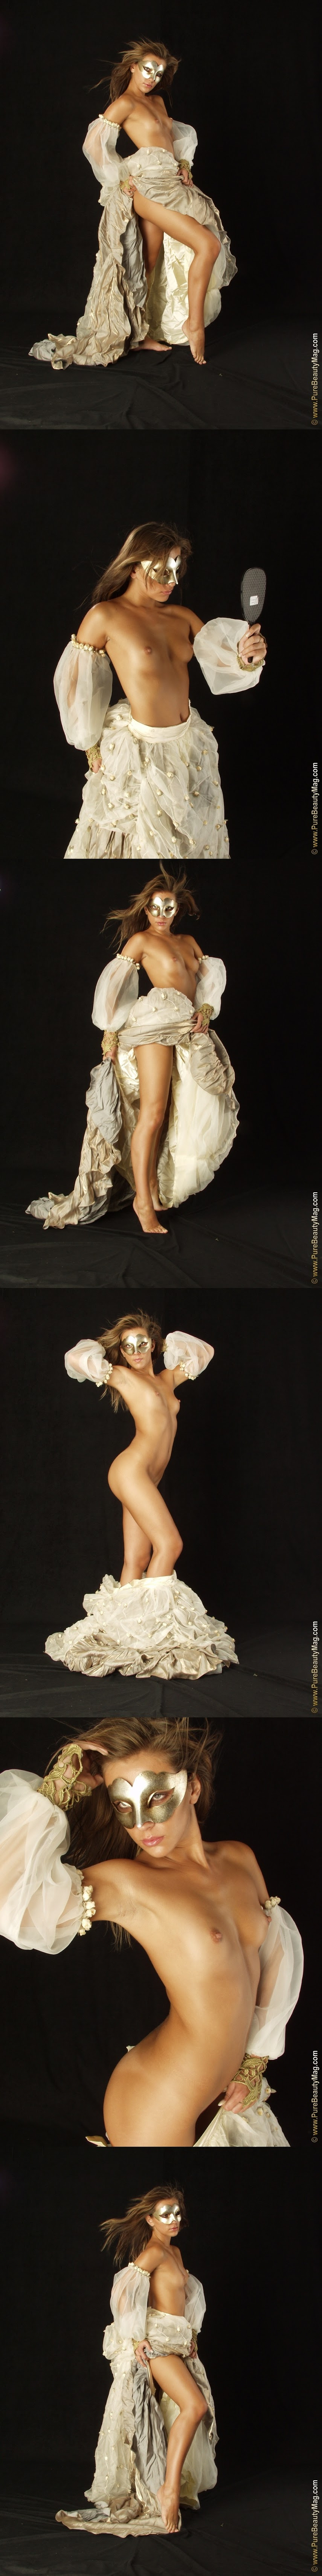 PureBeautyMag PBM  - 2005-03-06 -  s25838 - Kristyna - Masquerade - 2560px